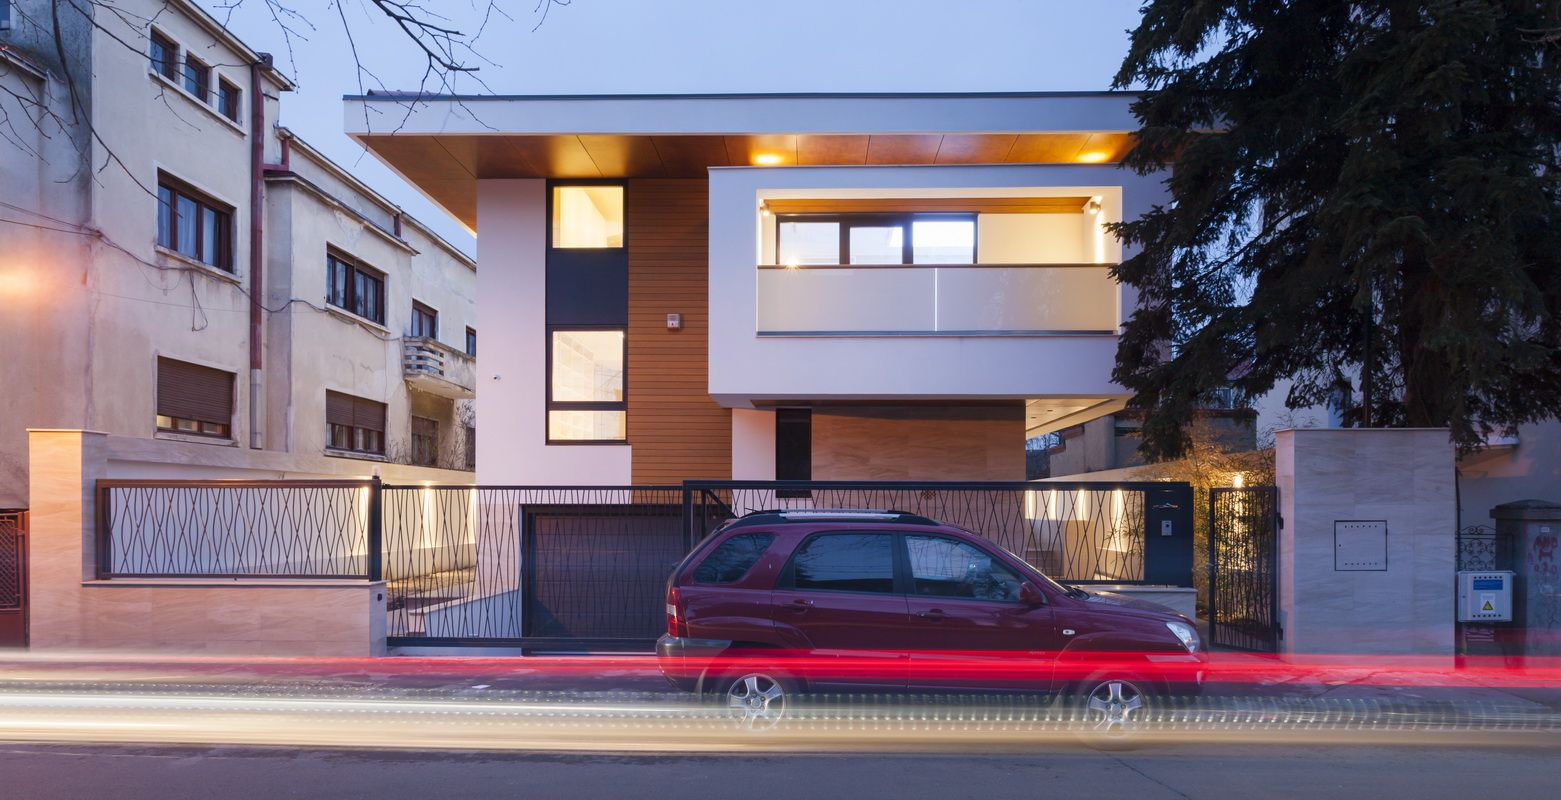 https://nbc-arhitect.ro/wp-content/uploads/2020/10/NBC-ARHITECT-_-housing-_-Sandu-Aldea-House-Villa-_-exterior-view-_-facade.jpg